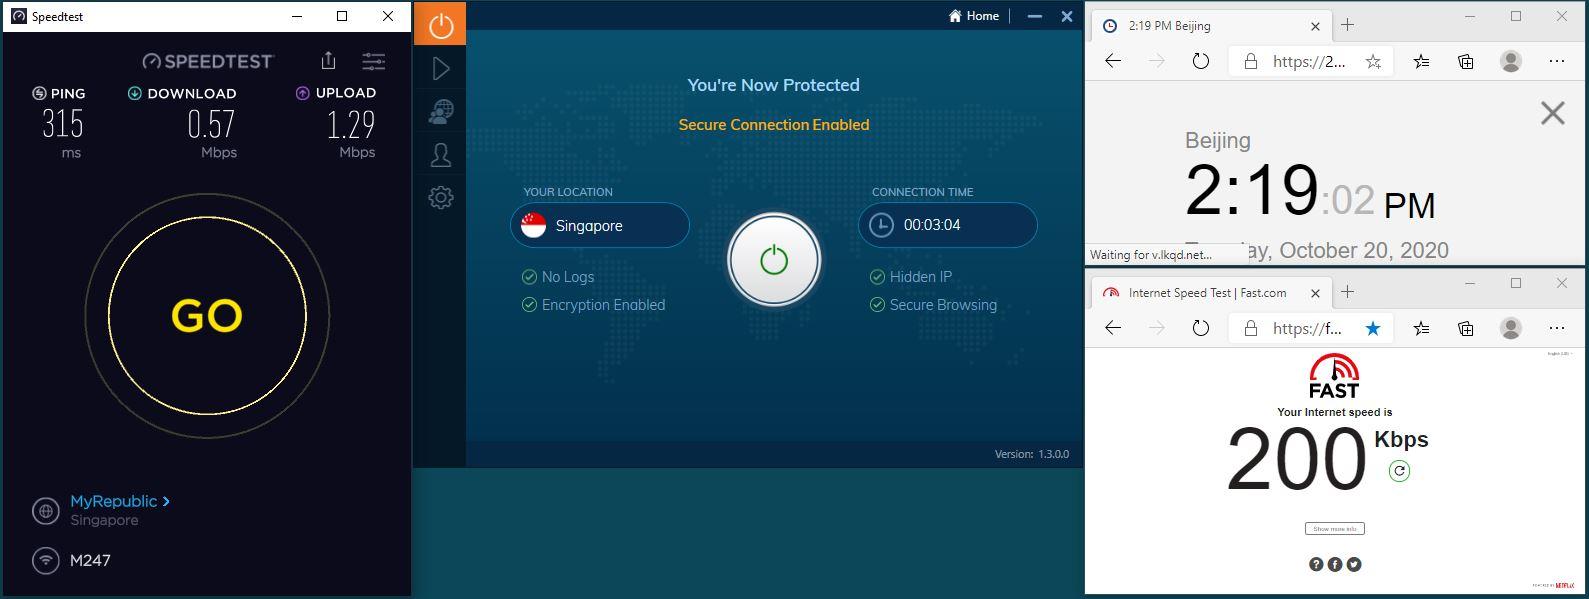 Windows10 IvacyVPN UDP+5555端口 Singapore 服务器 中国VPN 翻墙 科学上网 翻墙速度测试 - 20201020